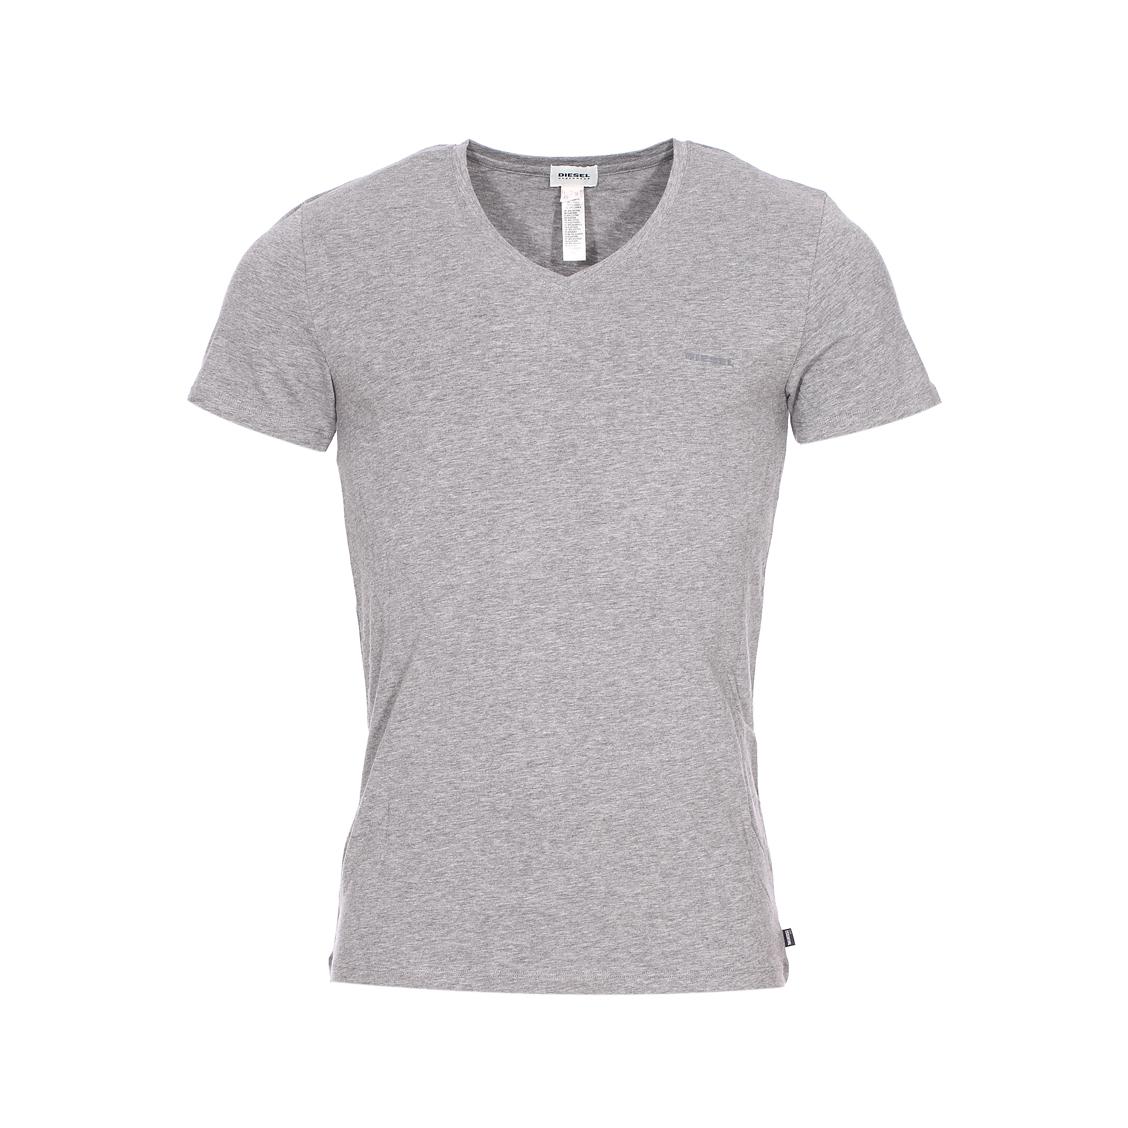 Tee-shirt col v diesel en coton stretch gris